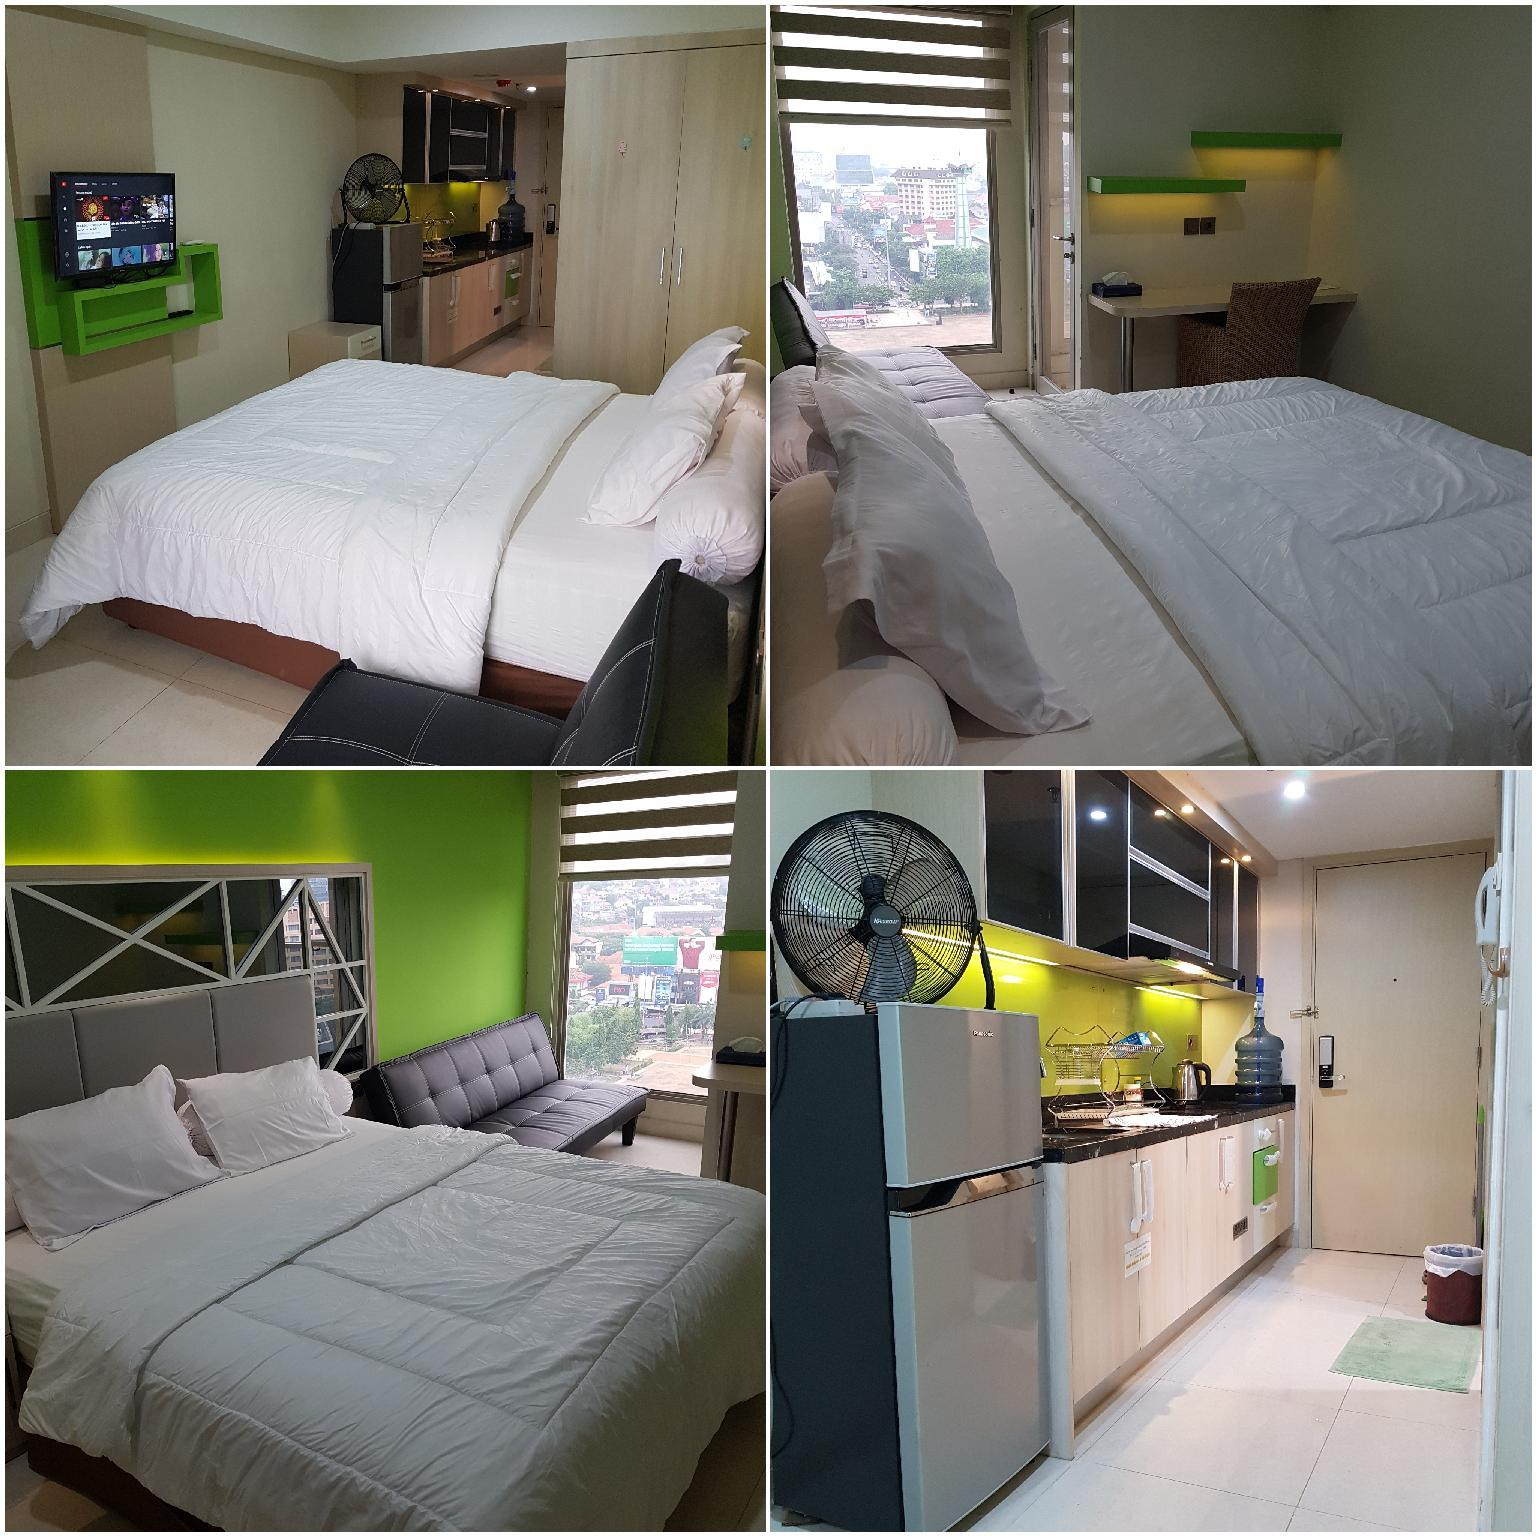 WR Apartment Louis Kienne Simpang 5 Semarang Lt.17